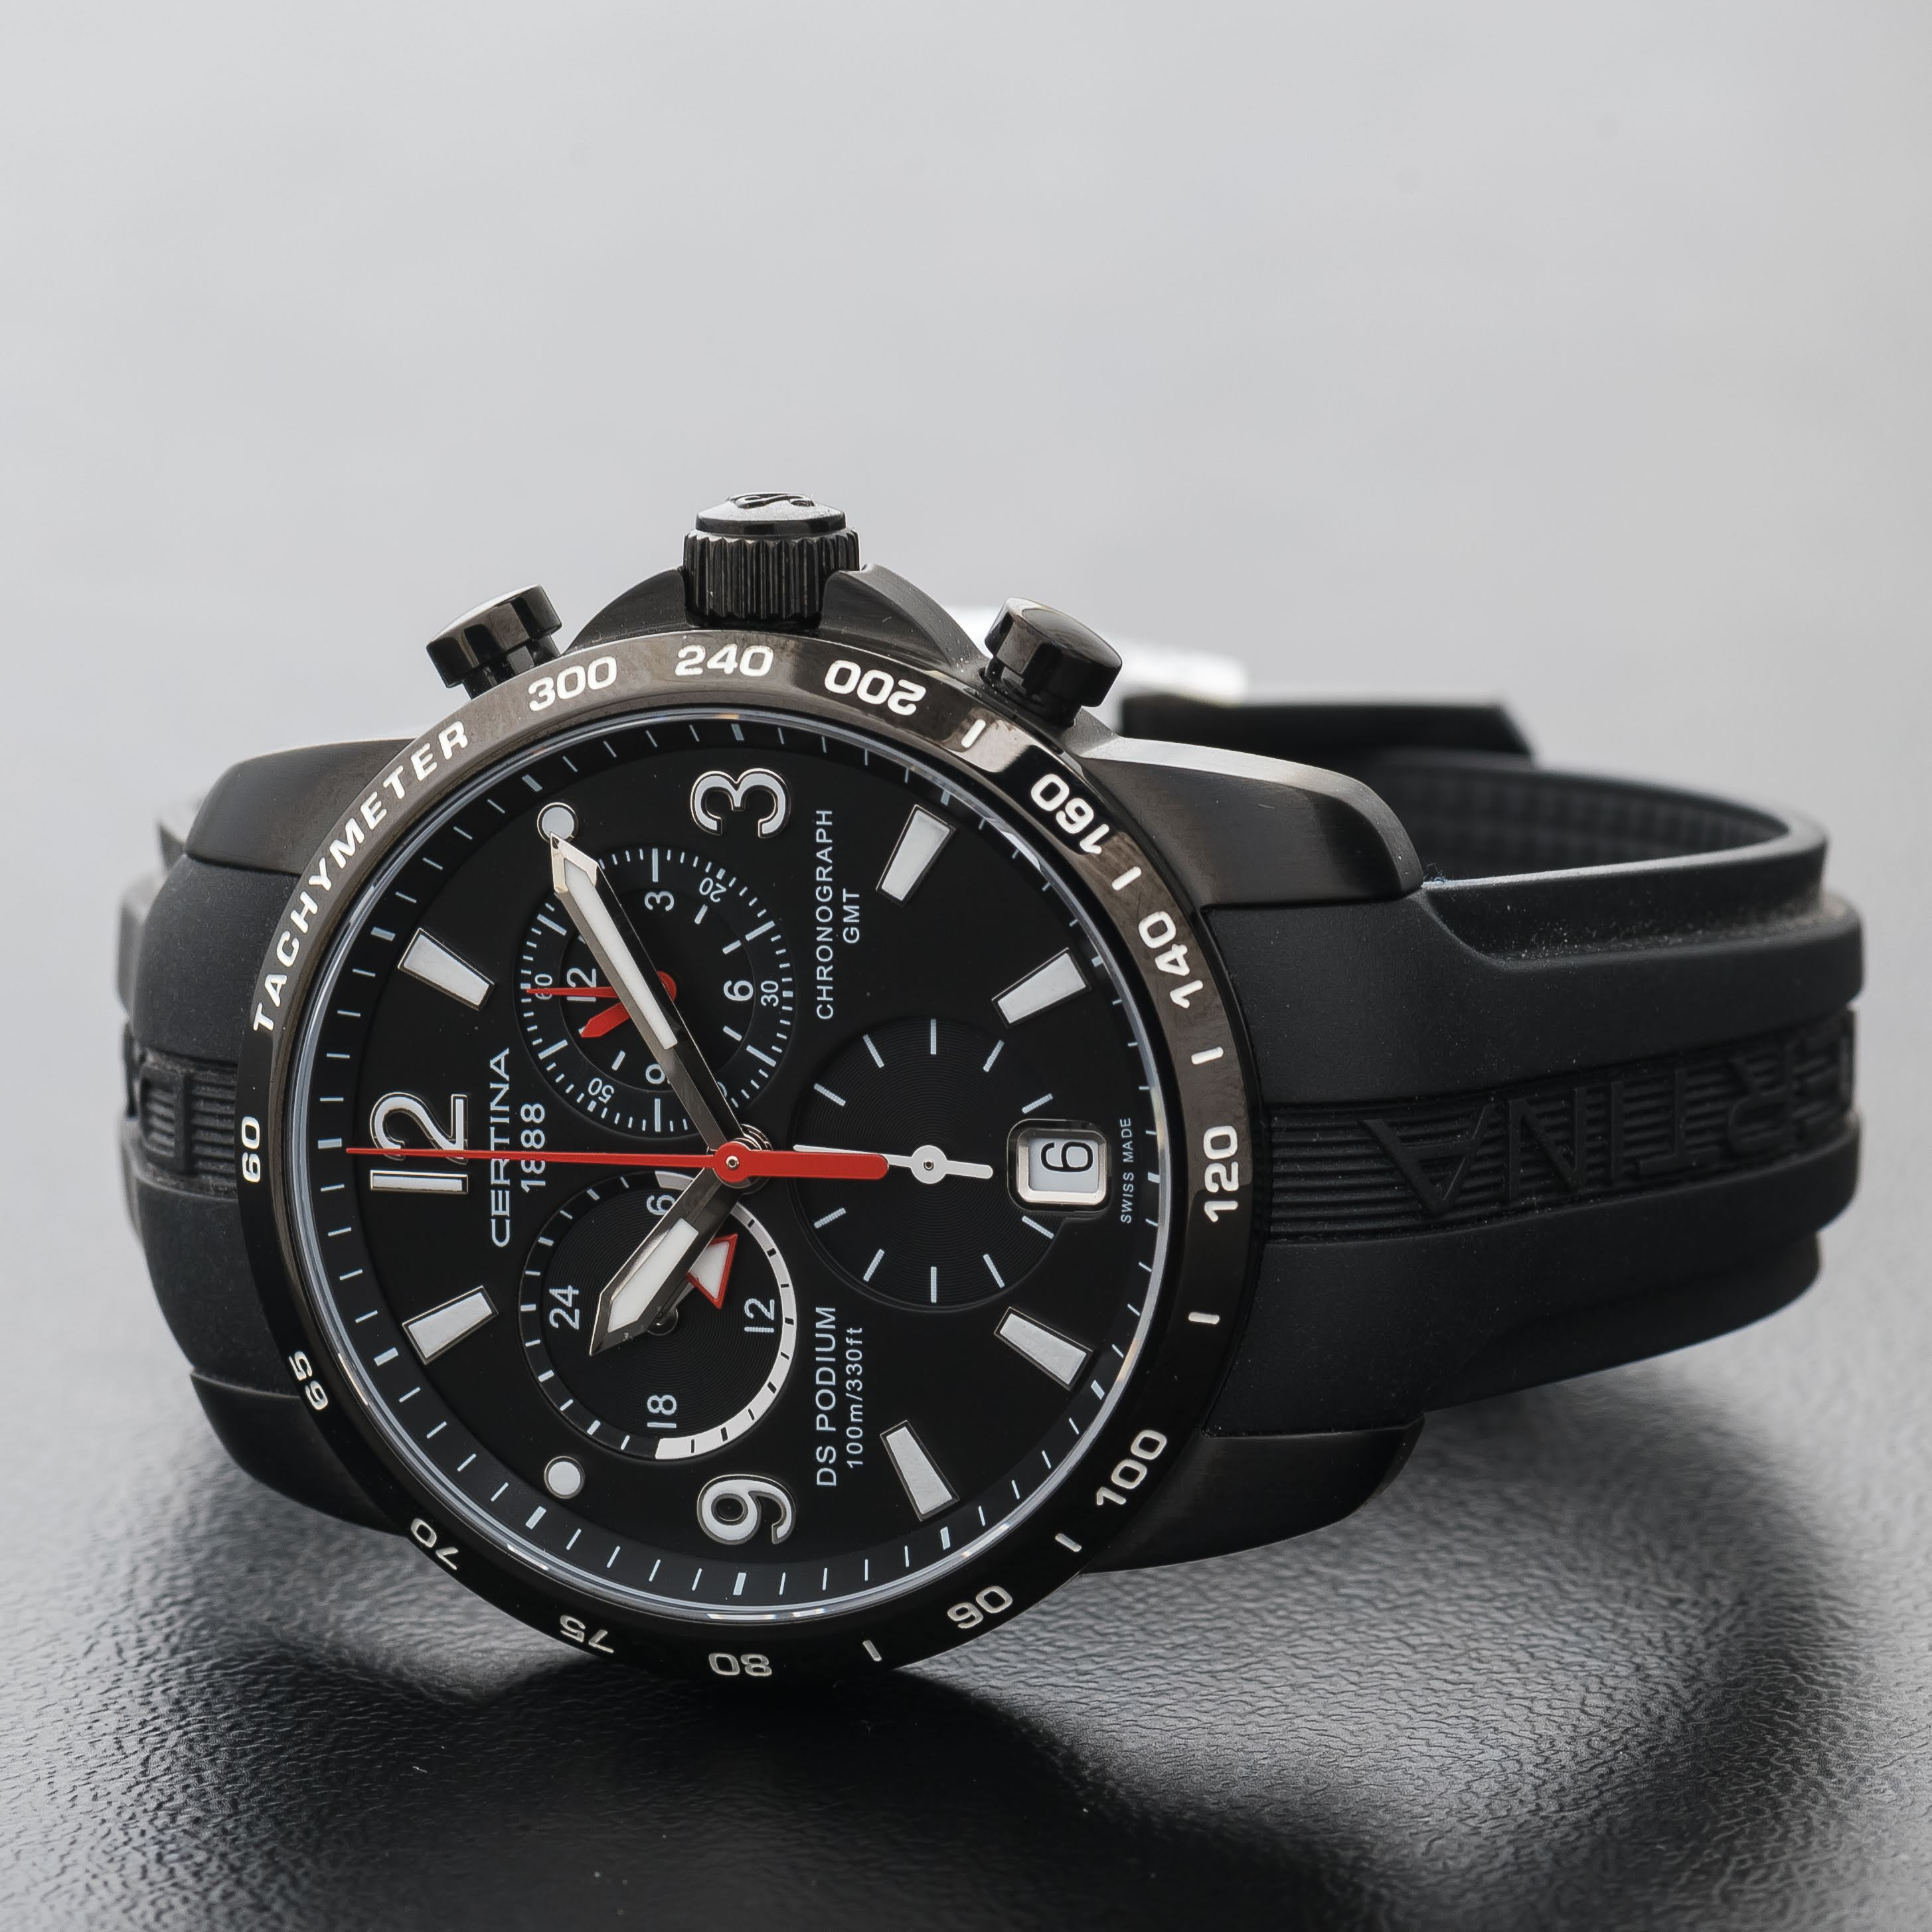 Certina DS Podium GMT Chronograph Big Size Black Dial Men's Watch C0016391605700